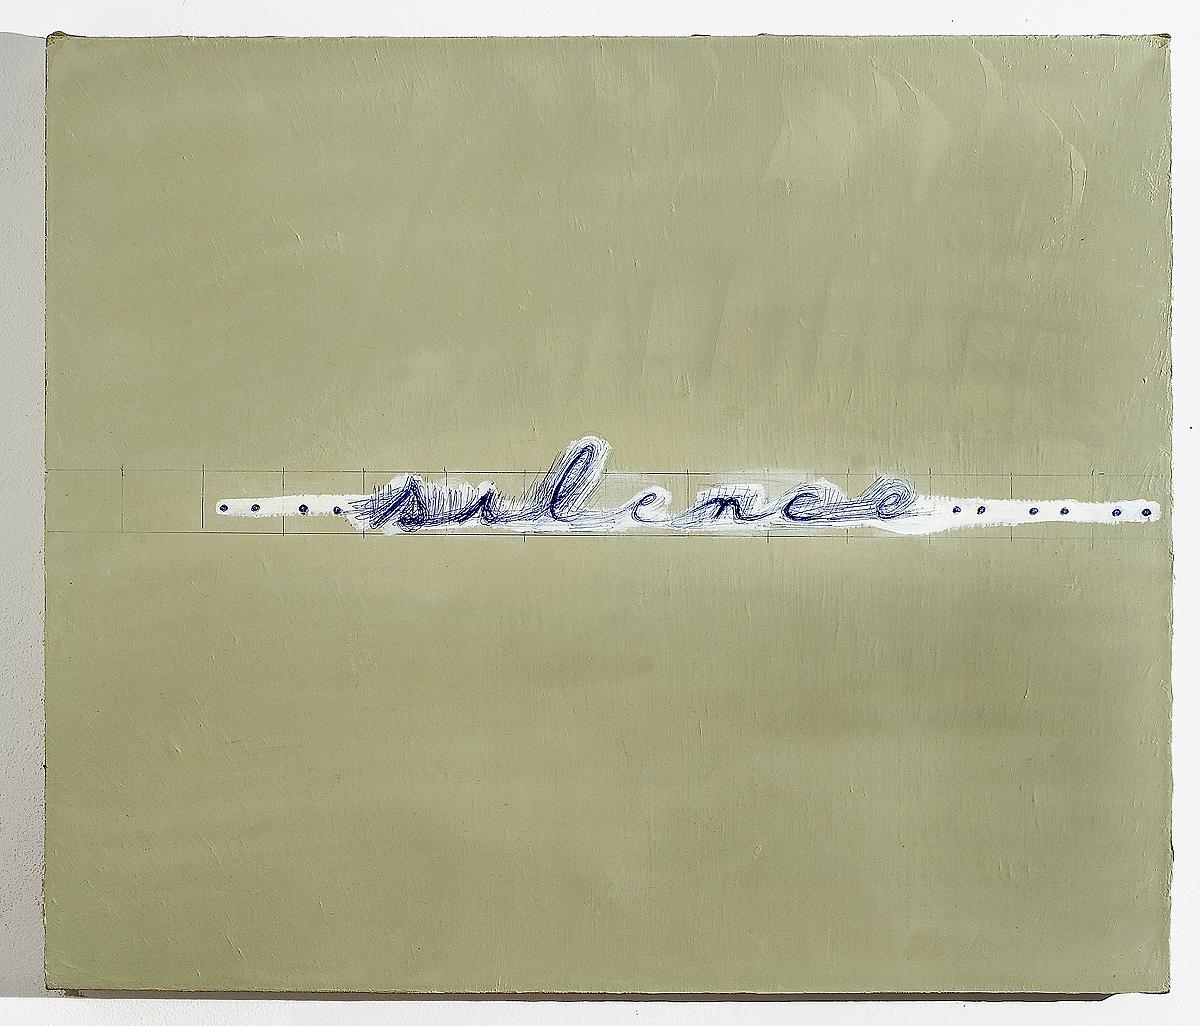 Mira Schor   Silence , 2006  Oil and ballpoint pen on linen  24 x 26 inches